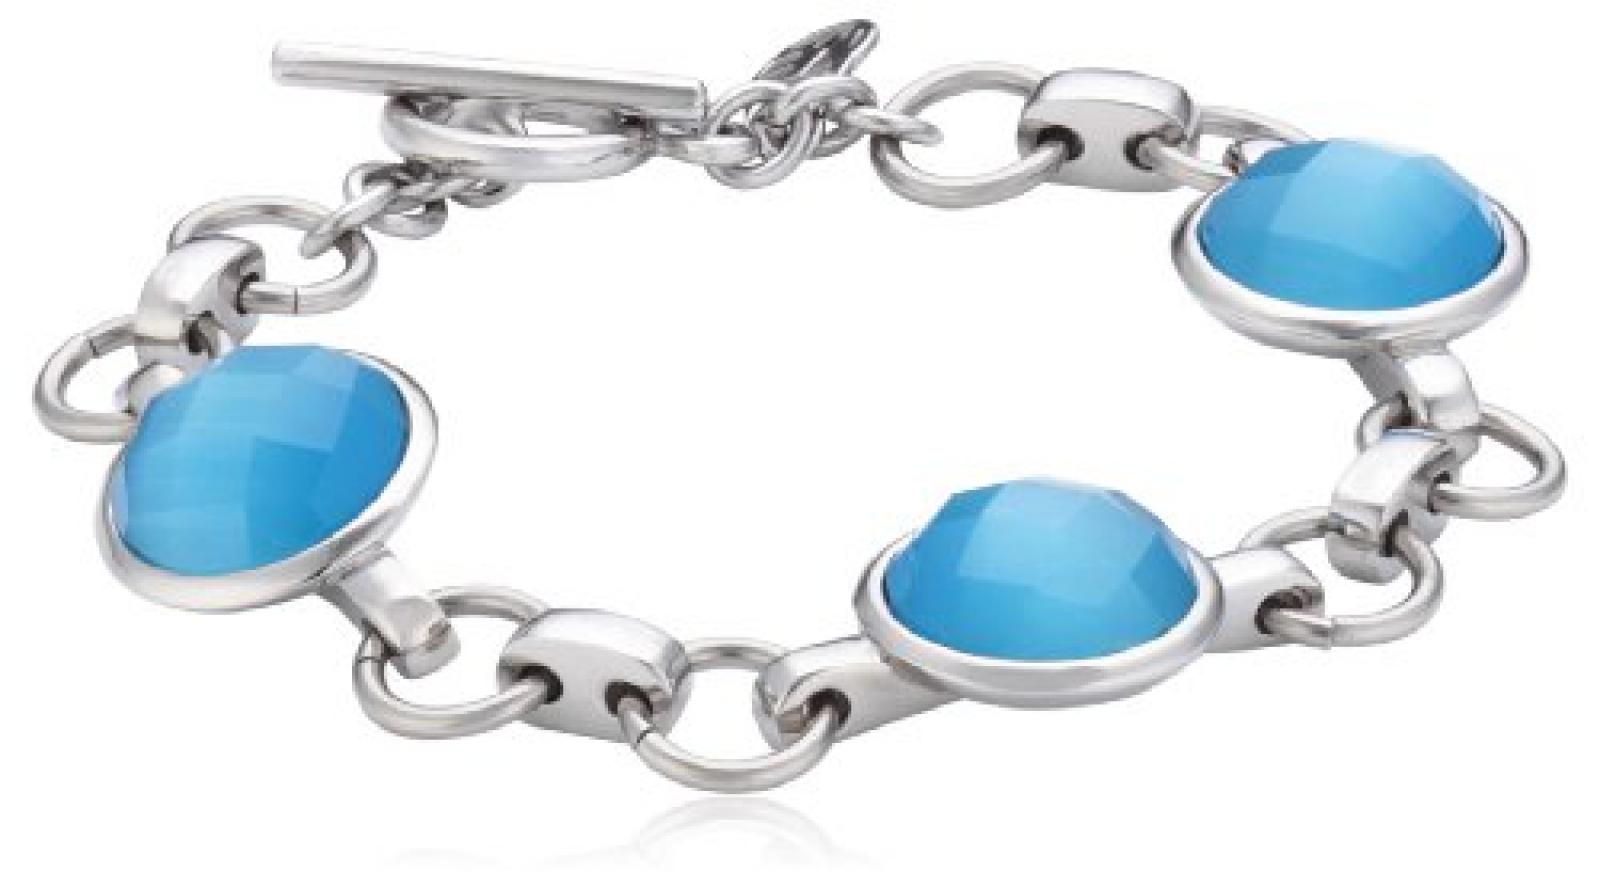 Mike Ellis New York Damen Armband Edelstahl Glas 19.0 cm S170 IPS BLUE